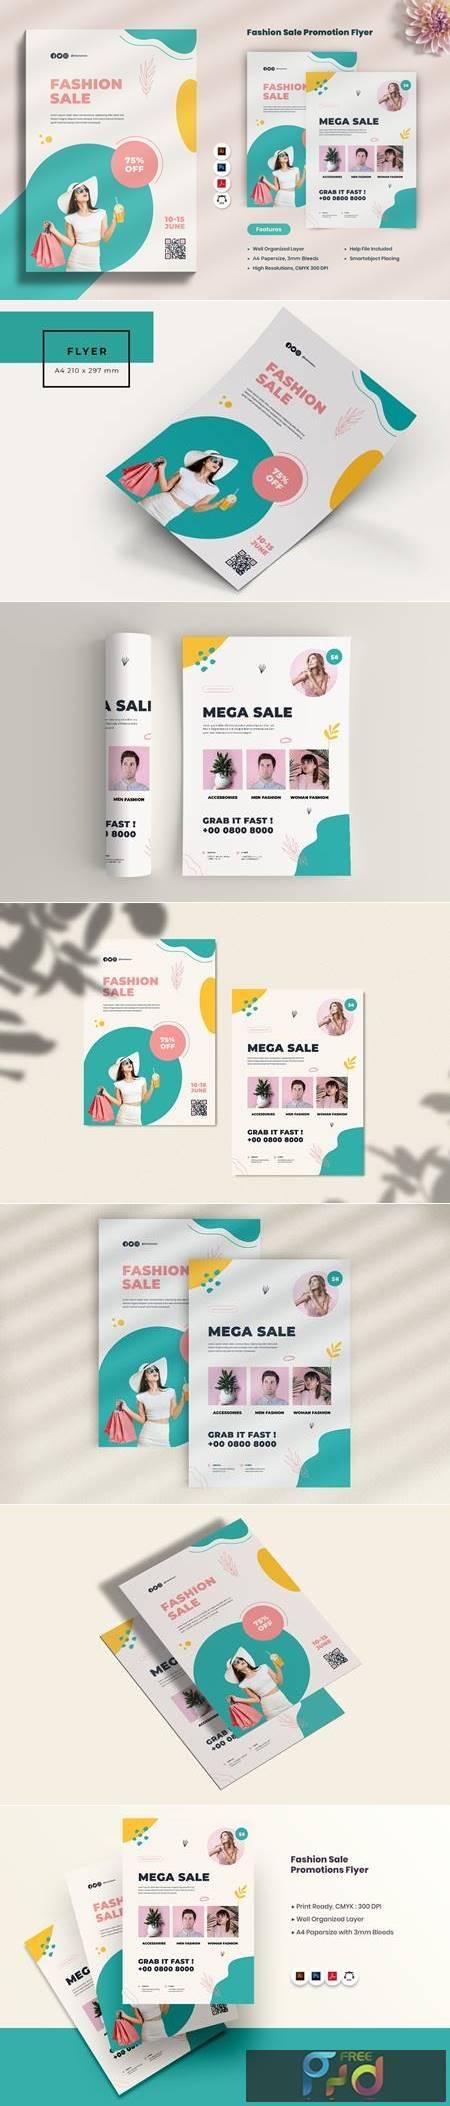 Fashion Sale Promotion Flyer XEM4MUC 1